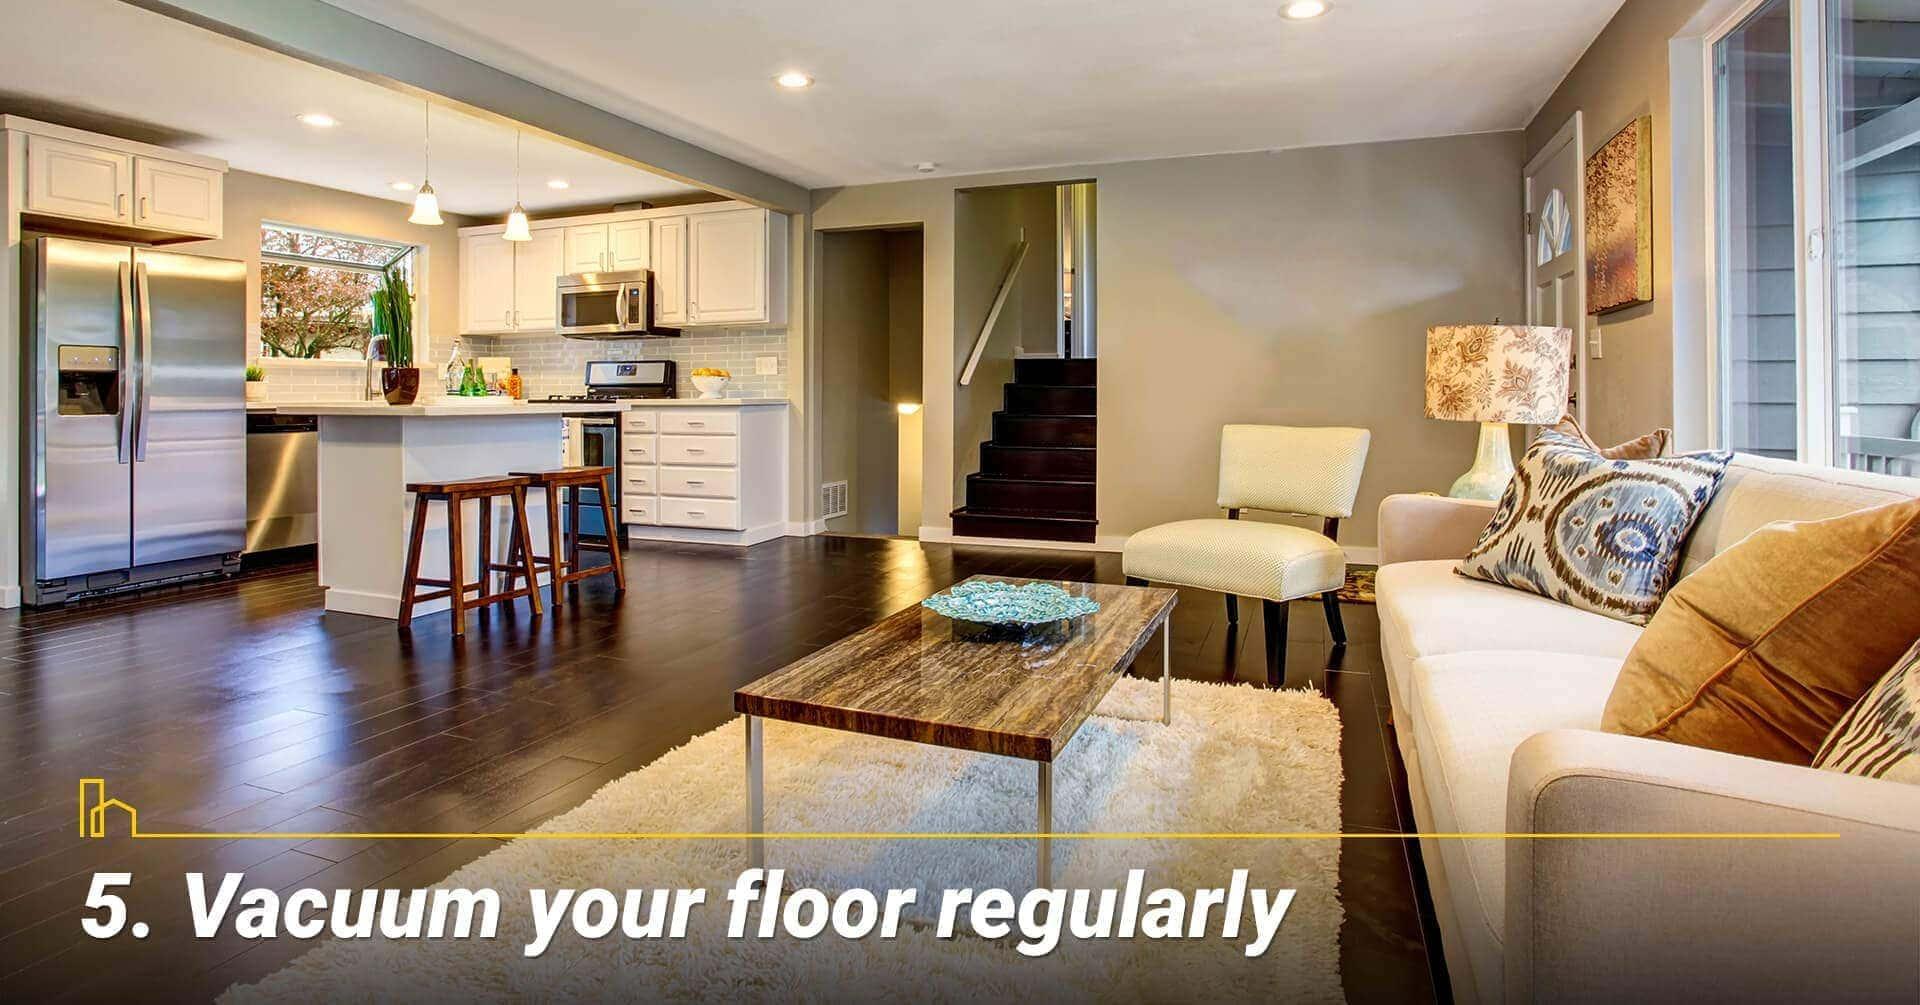 Vacuum your floor regularly, keep the floor clean